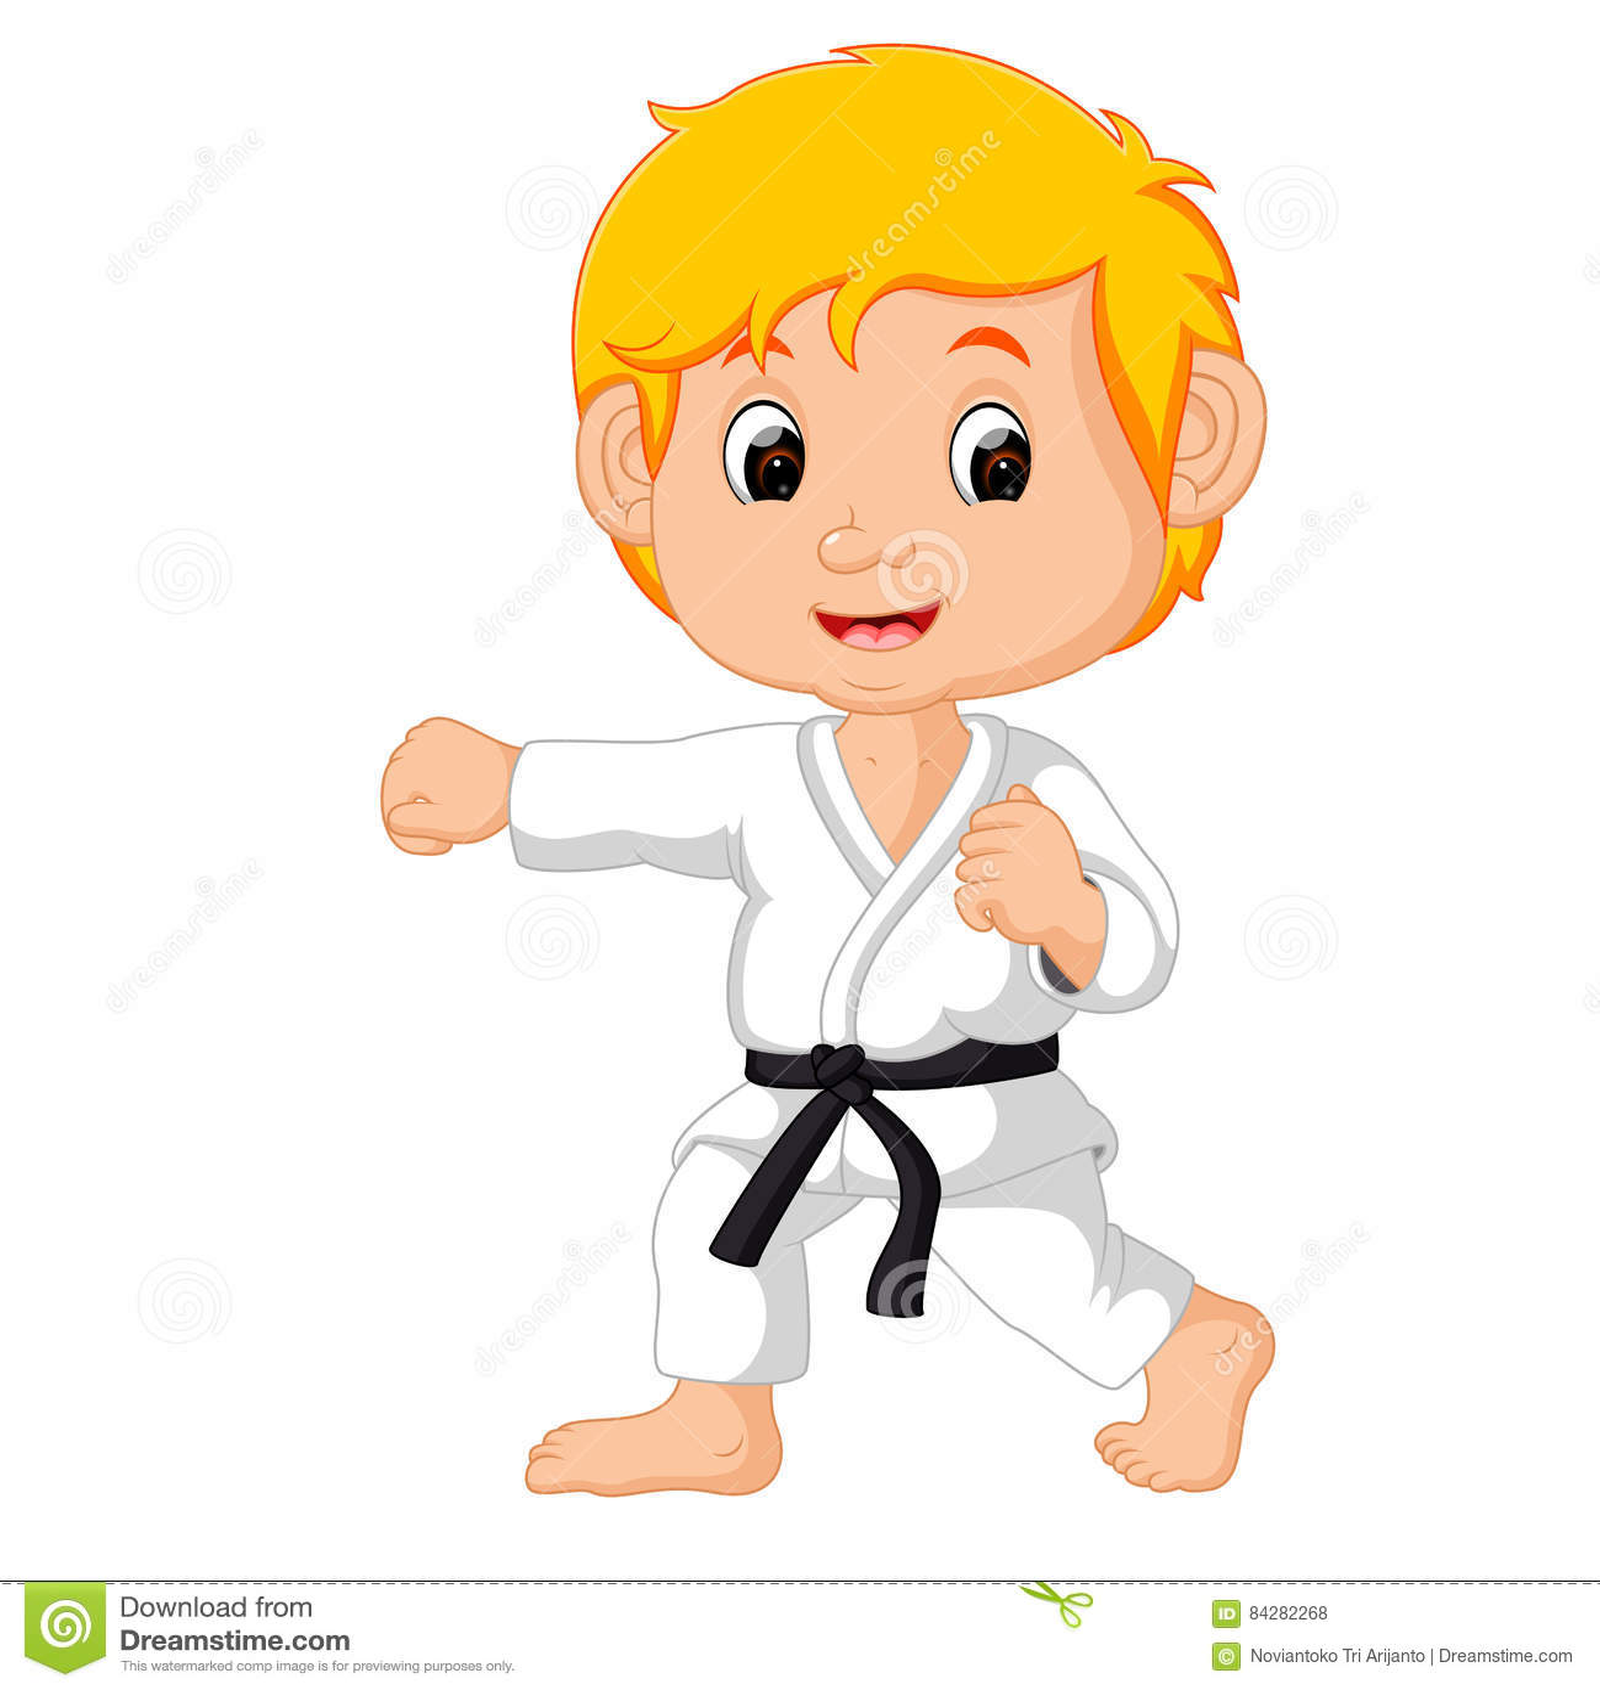 Karate kid stock vector. Illustration of judo, character ...